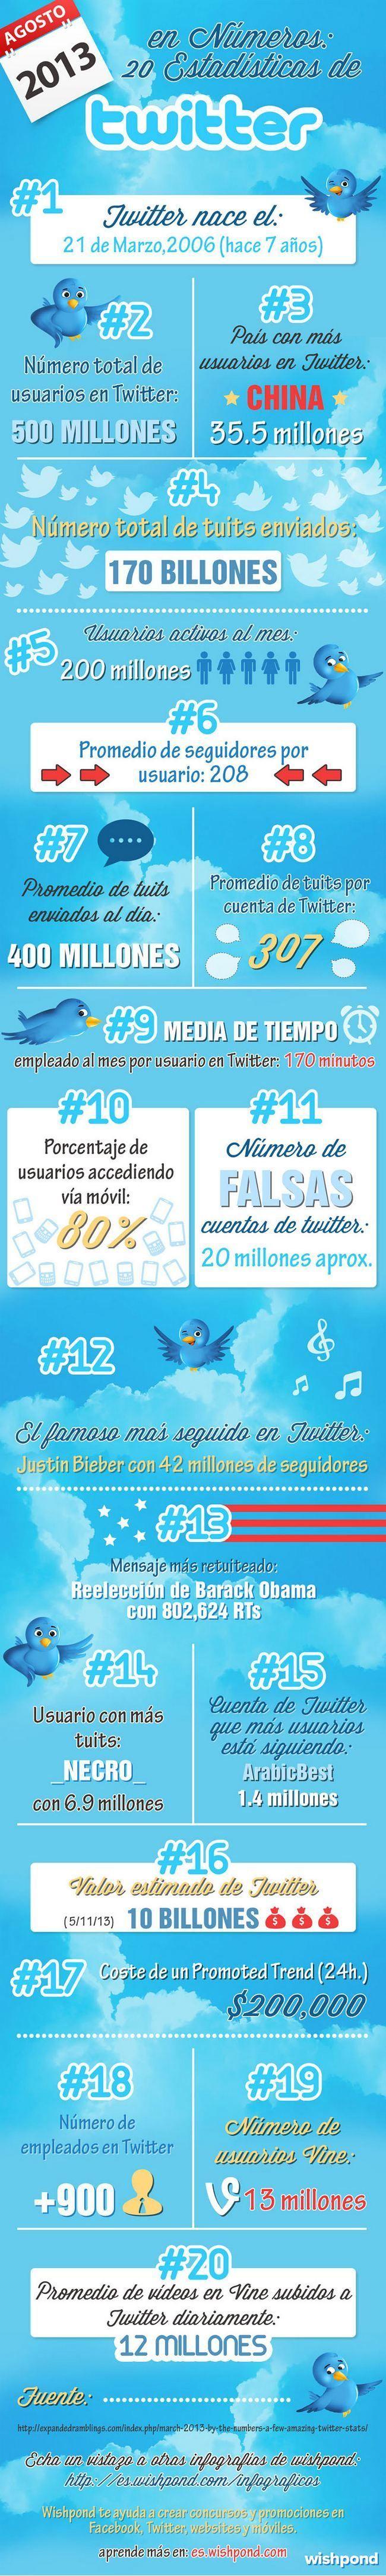 Twitter infografia agosto 2013